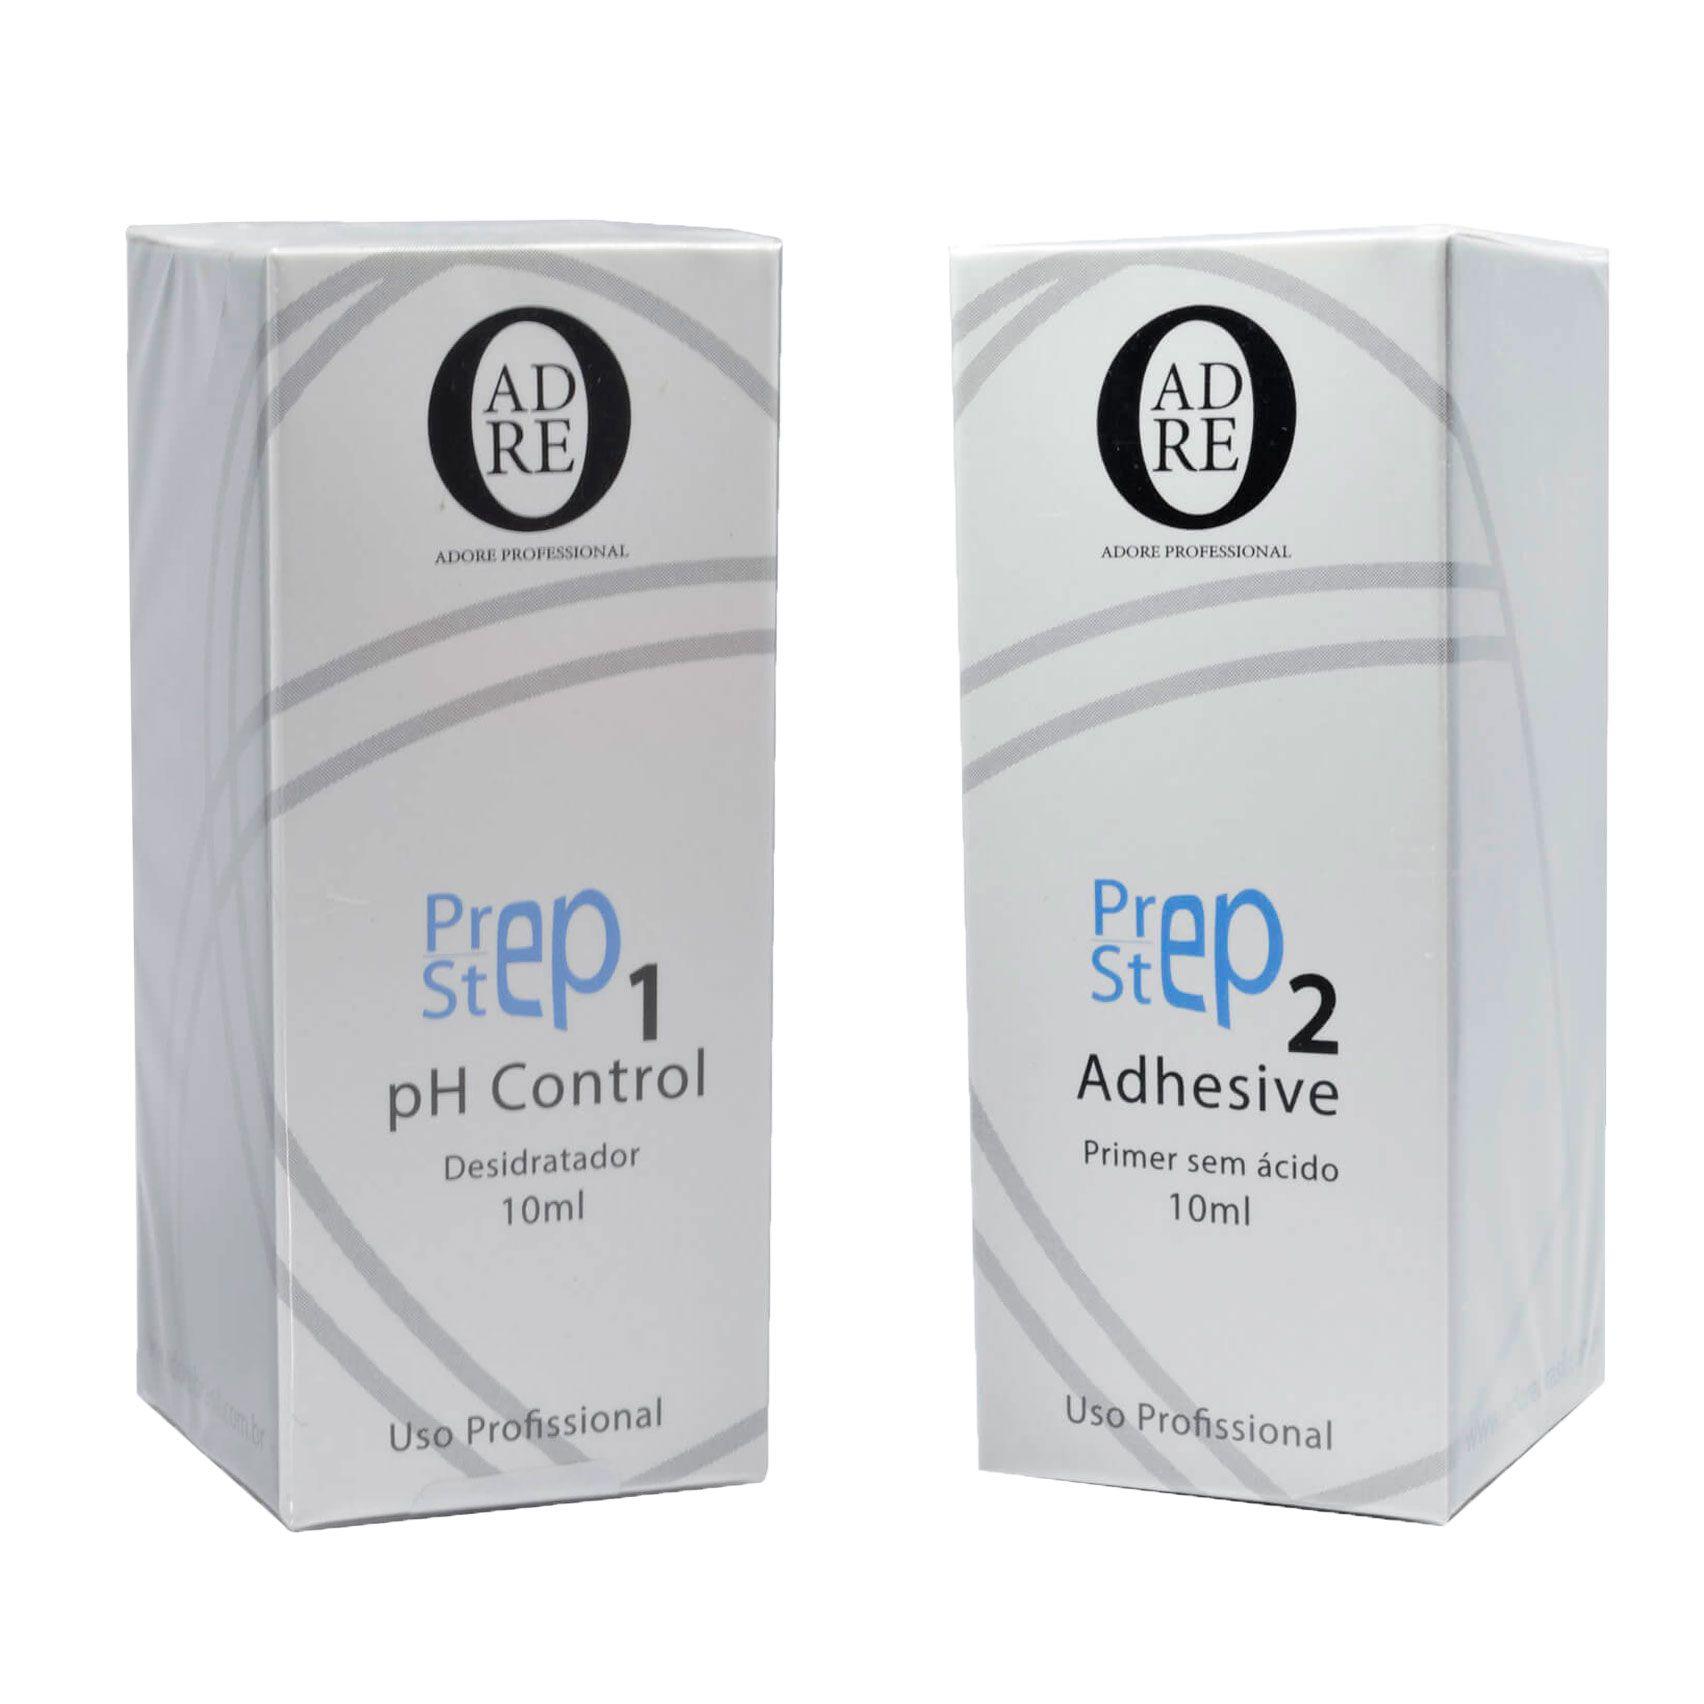 Kit Adore Desidratador Step 1 Ph 10ml + Primer Step 2 10ml